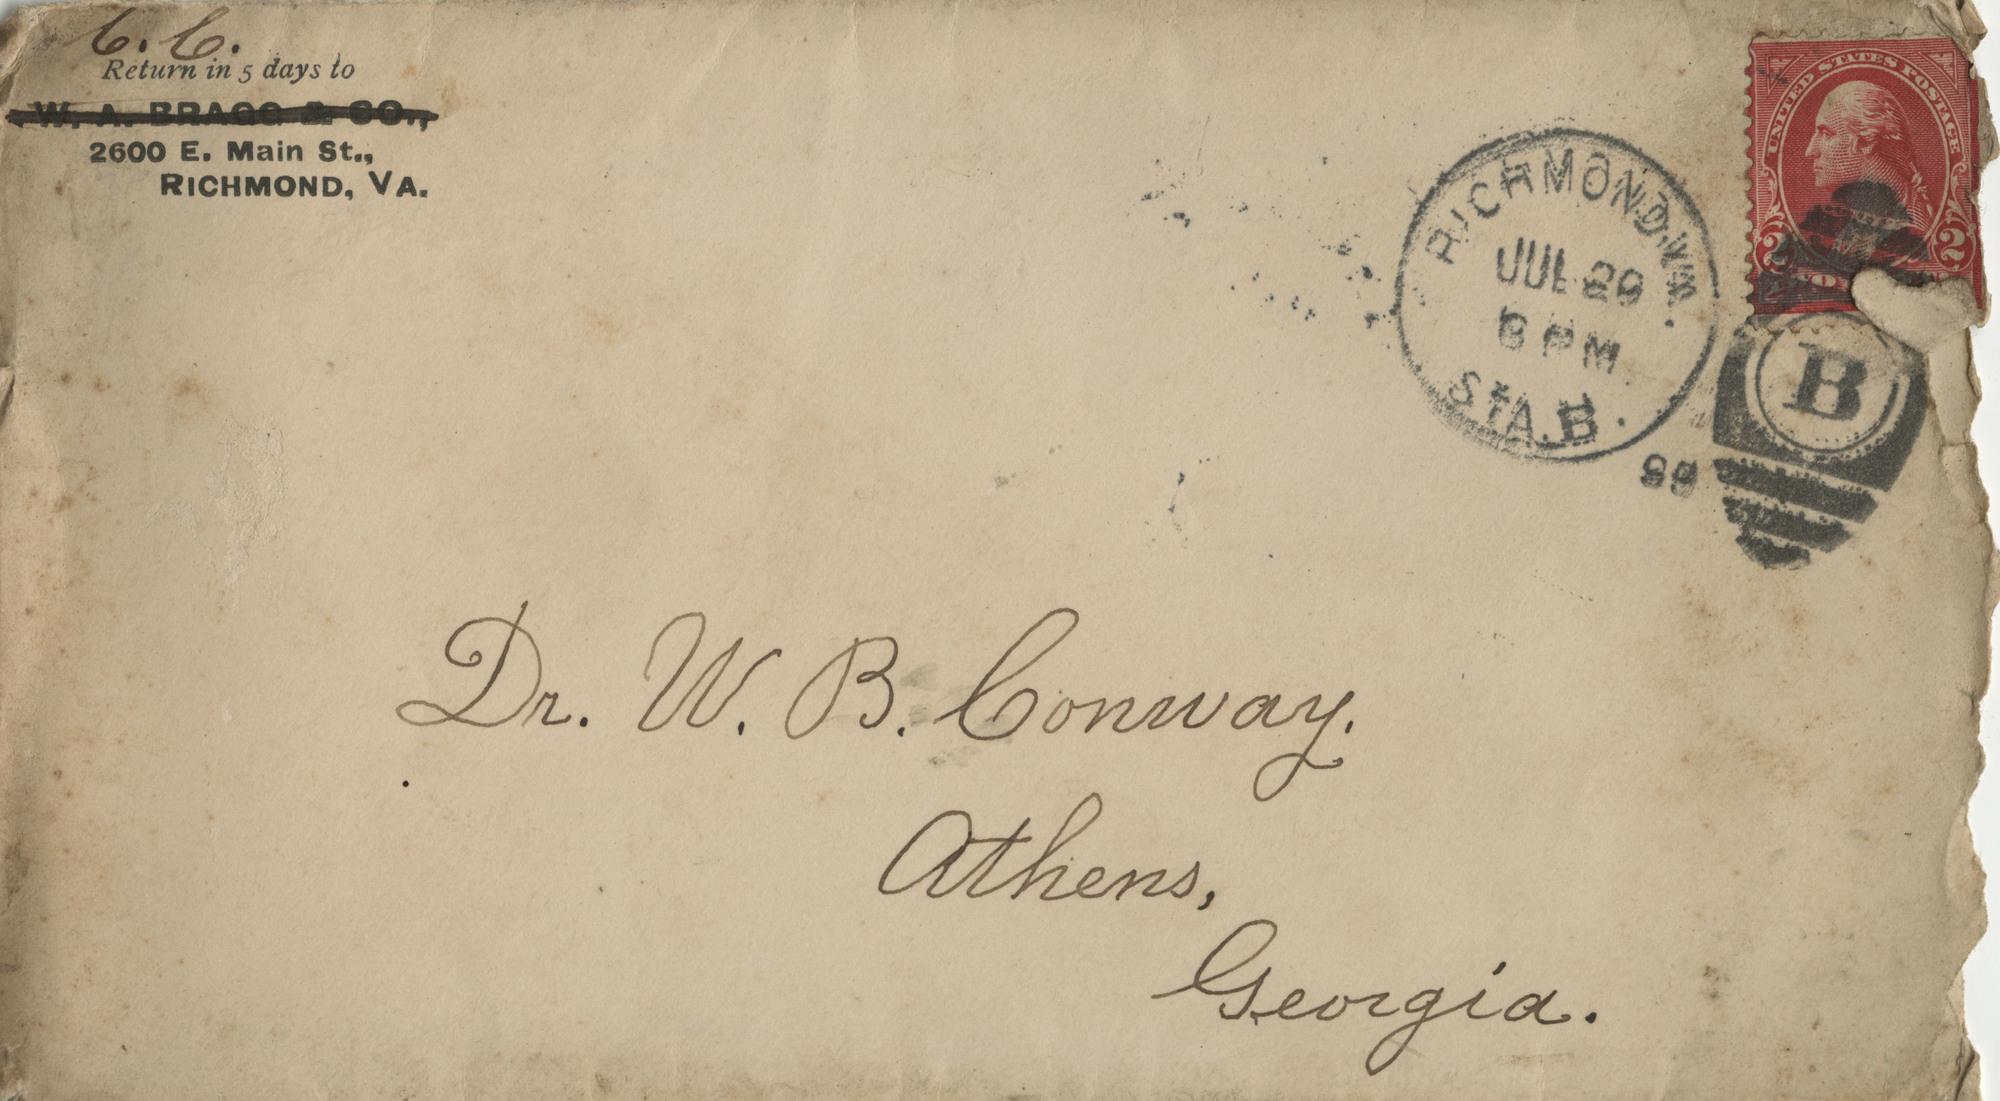 http://spec.lib.vt.edu/pickup/Omeka_upload/Ms2012-039_ConwayCatlett_F2_Letter_1899_0720_enva.jpg